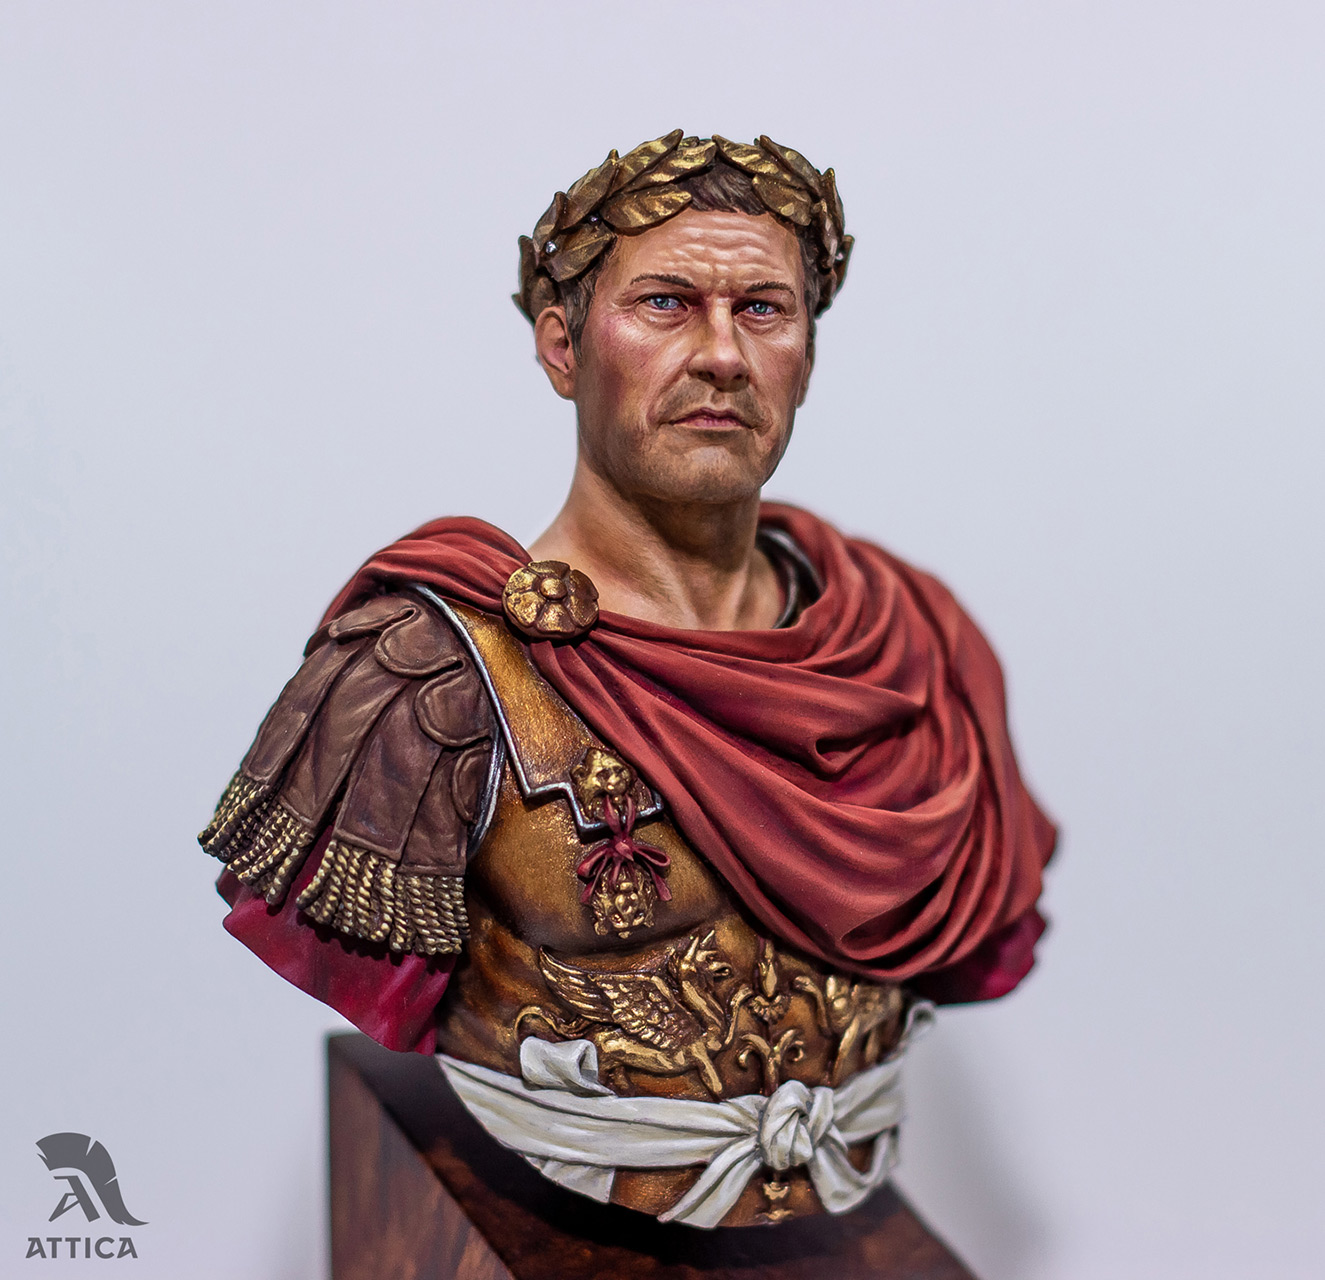 Figures: The Triumpher, photo #8